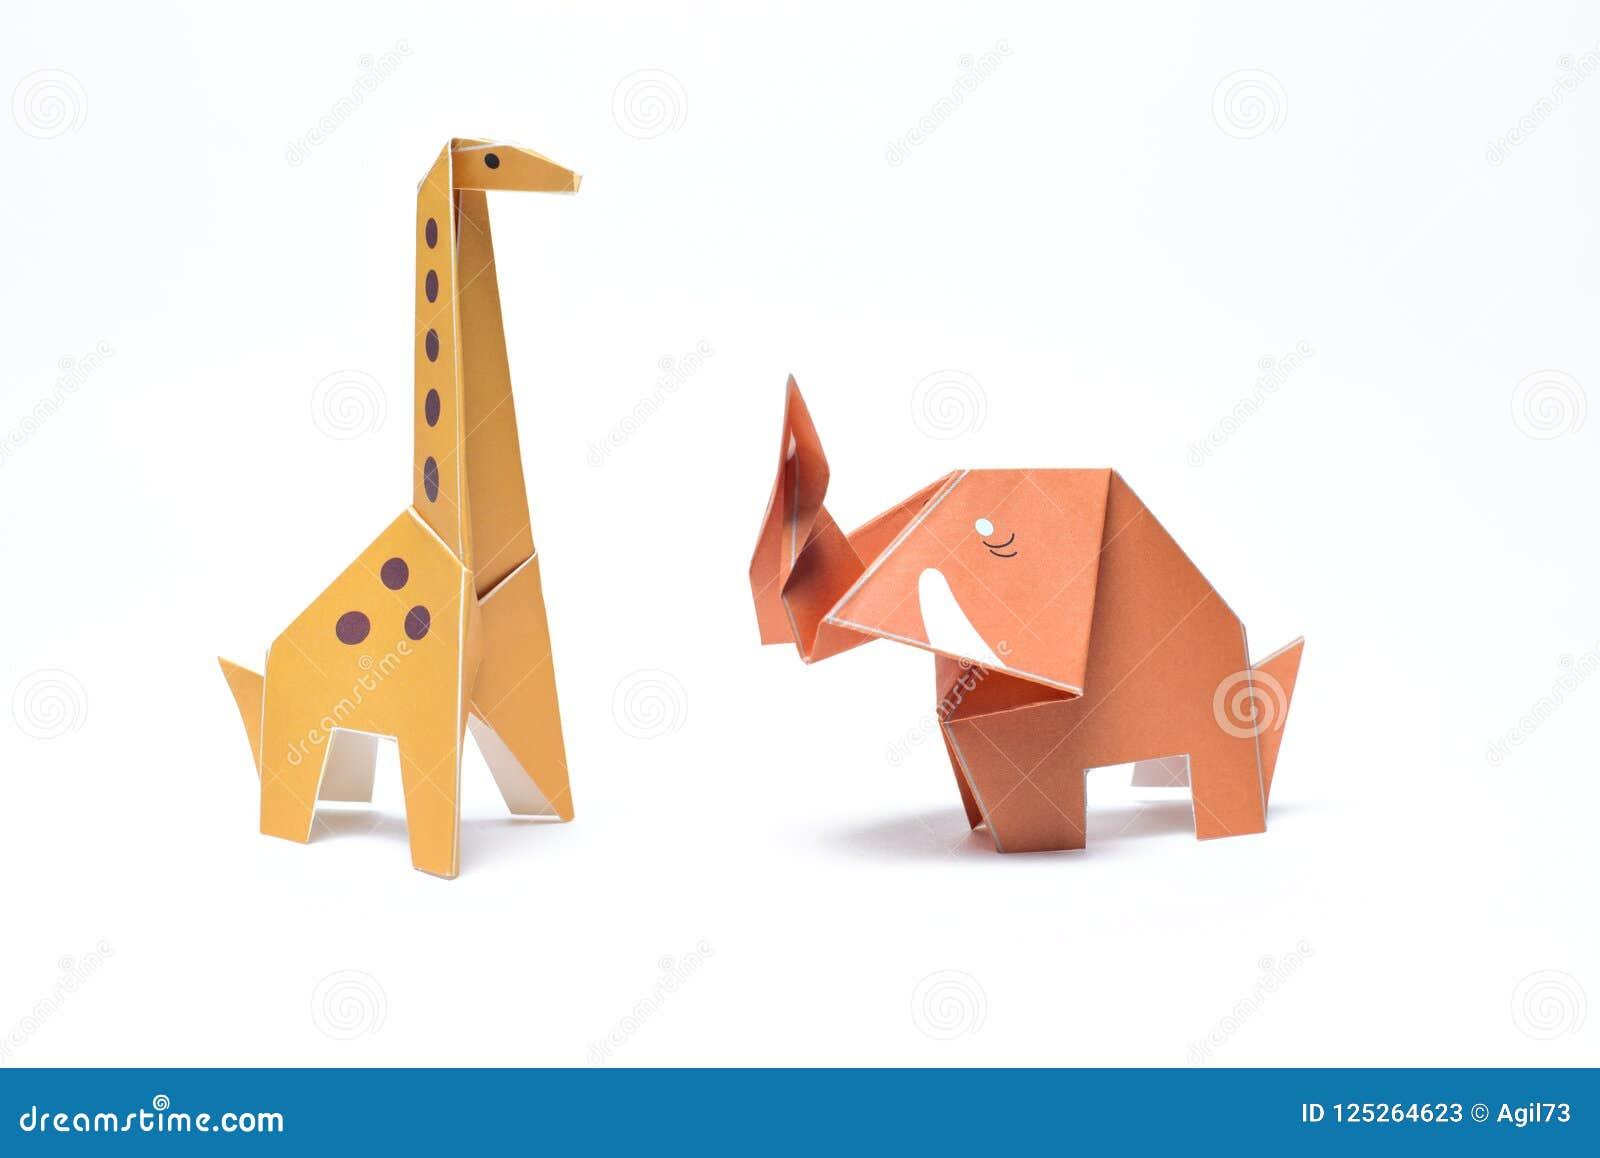 Origami Gele Giraf en Rode Olifant